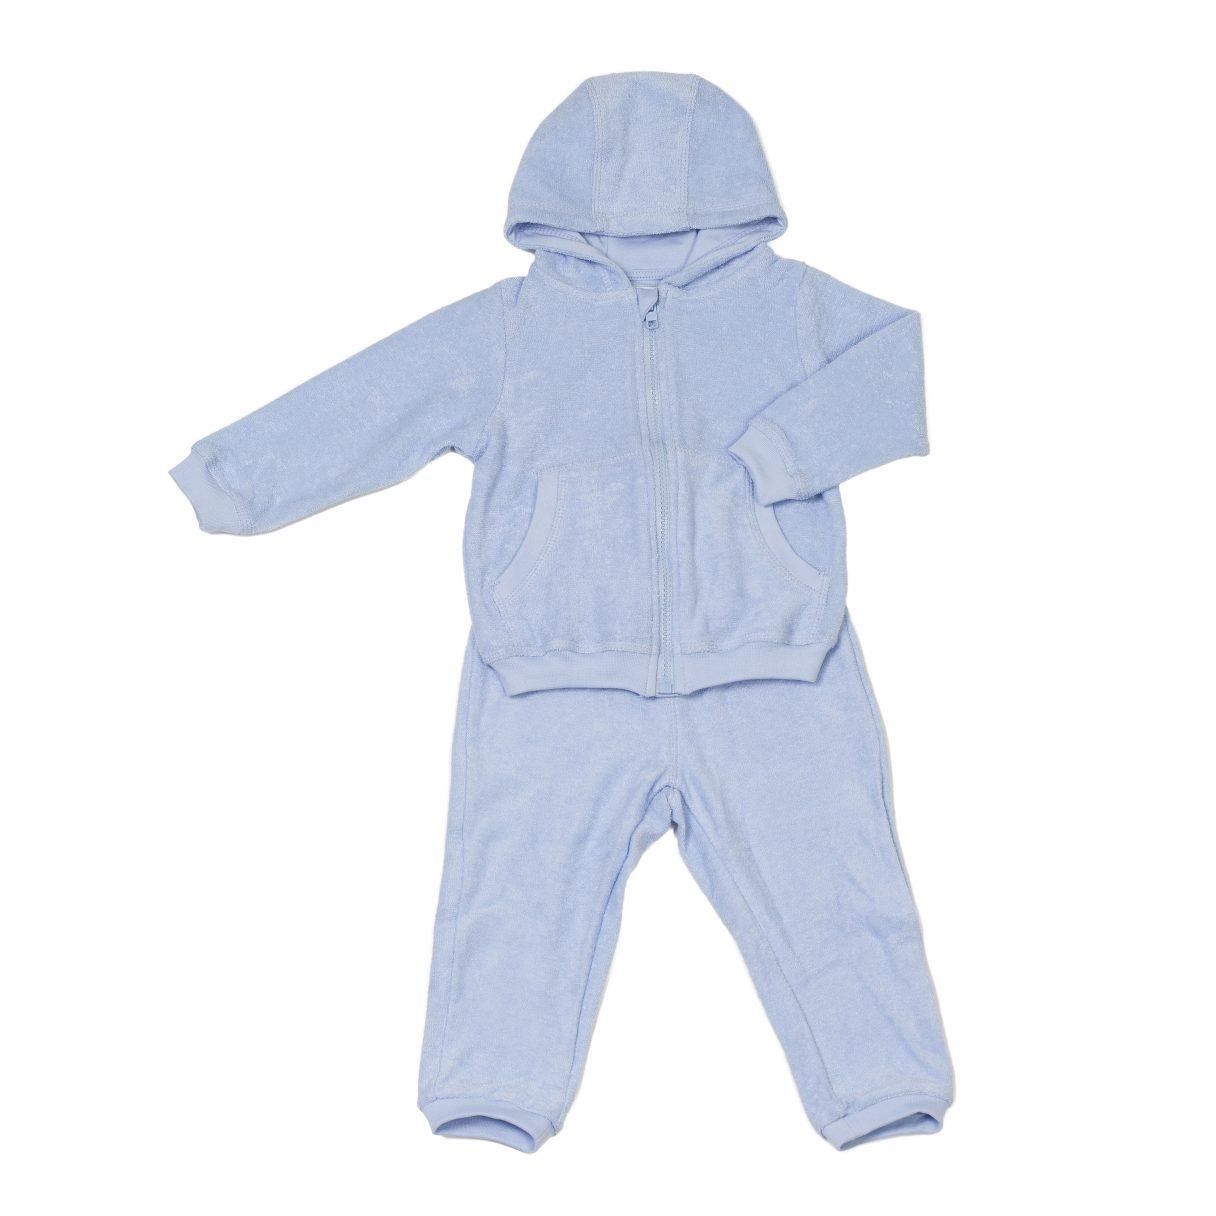 Baby Sweatsuit Blue